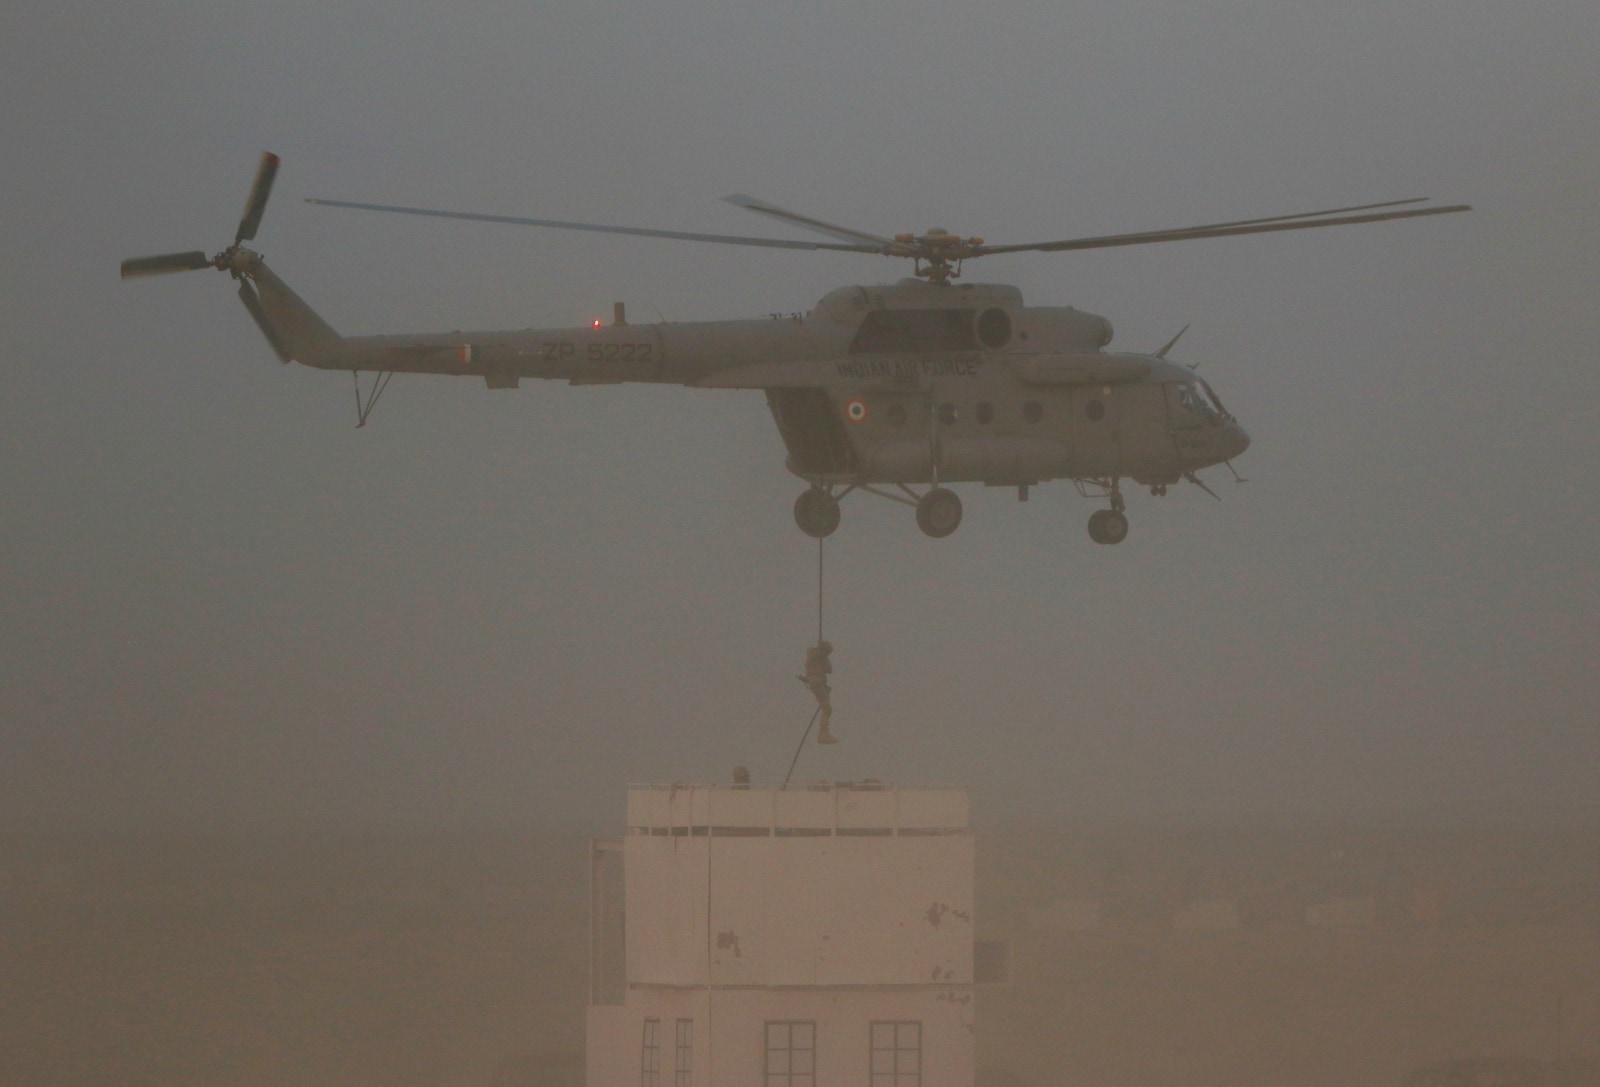 An Indian Air Force (IAF) Garud Commando performs during